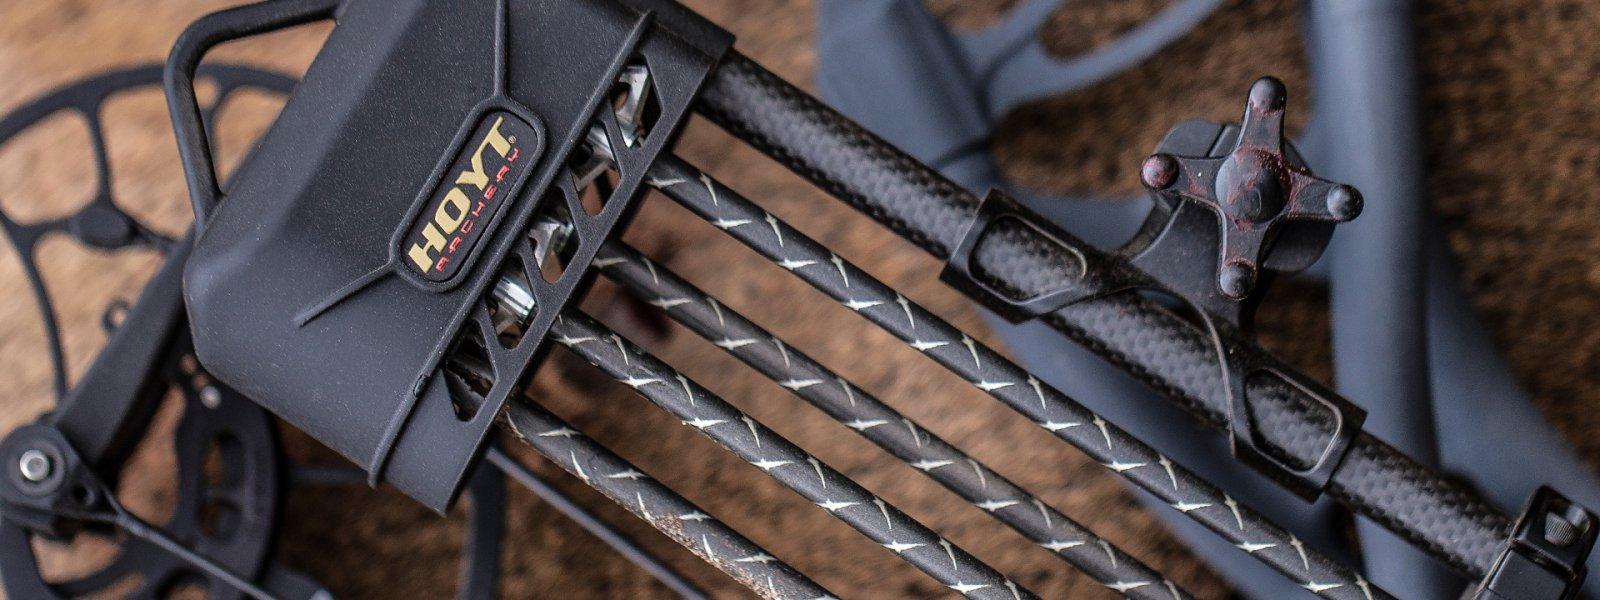 Optifade Subalpine NEW Hoyt Carbon Solo Shorty 4 Arrow Quick Detach Bow Quiver